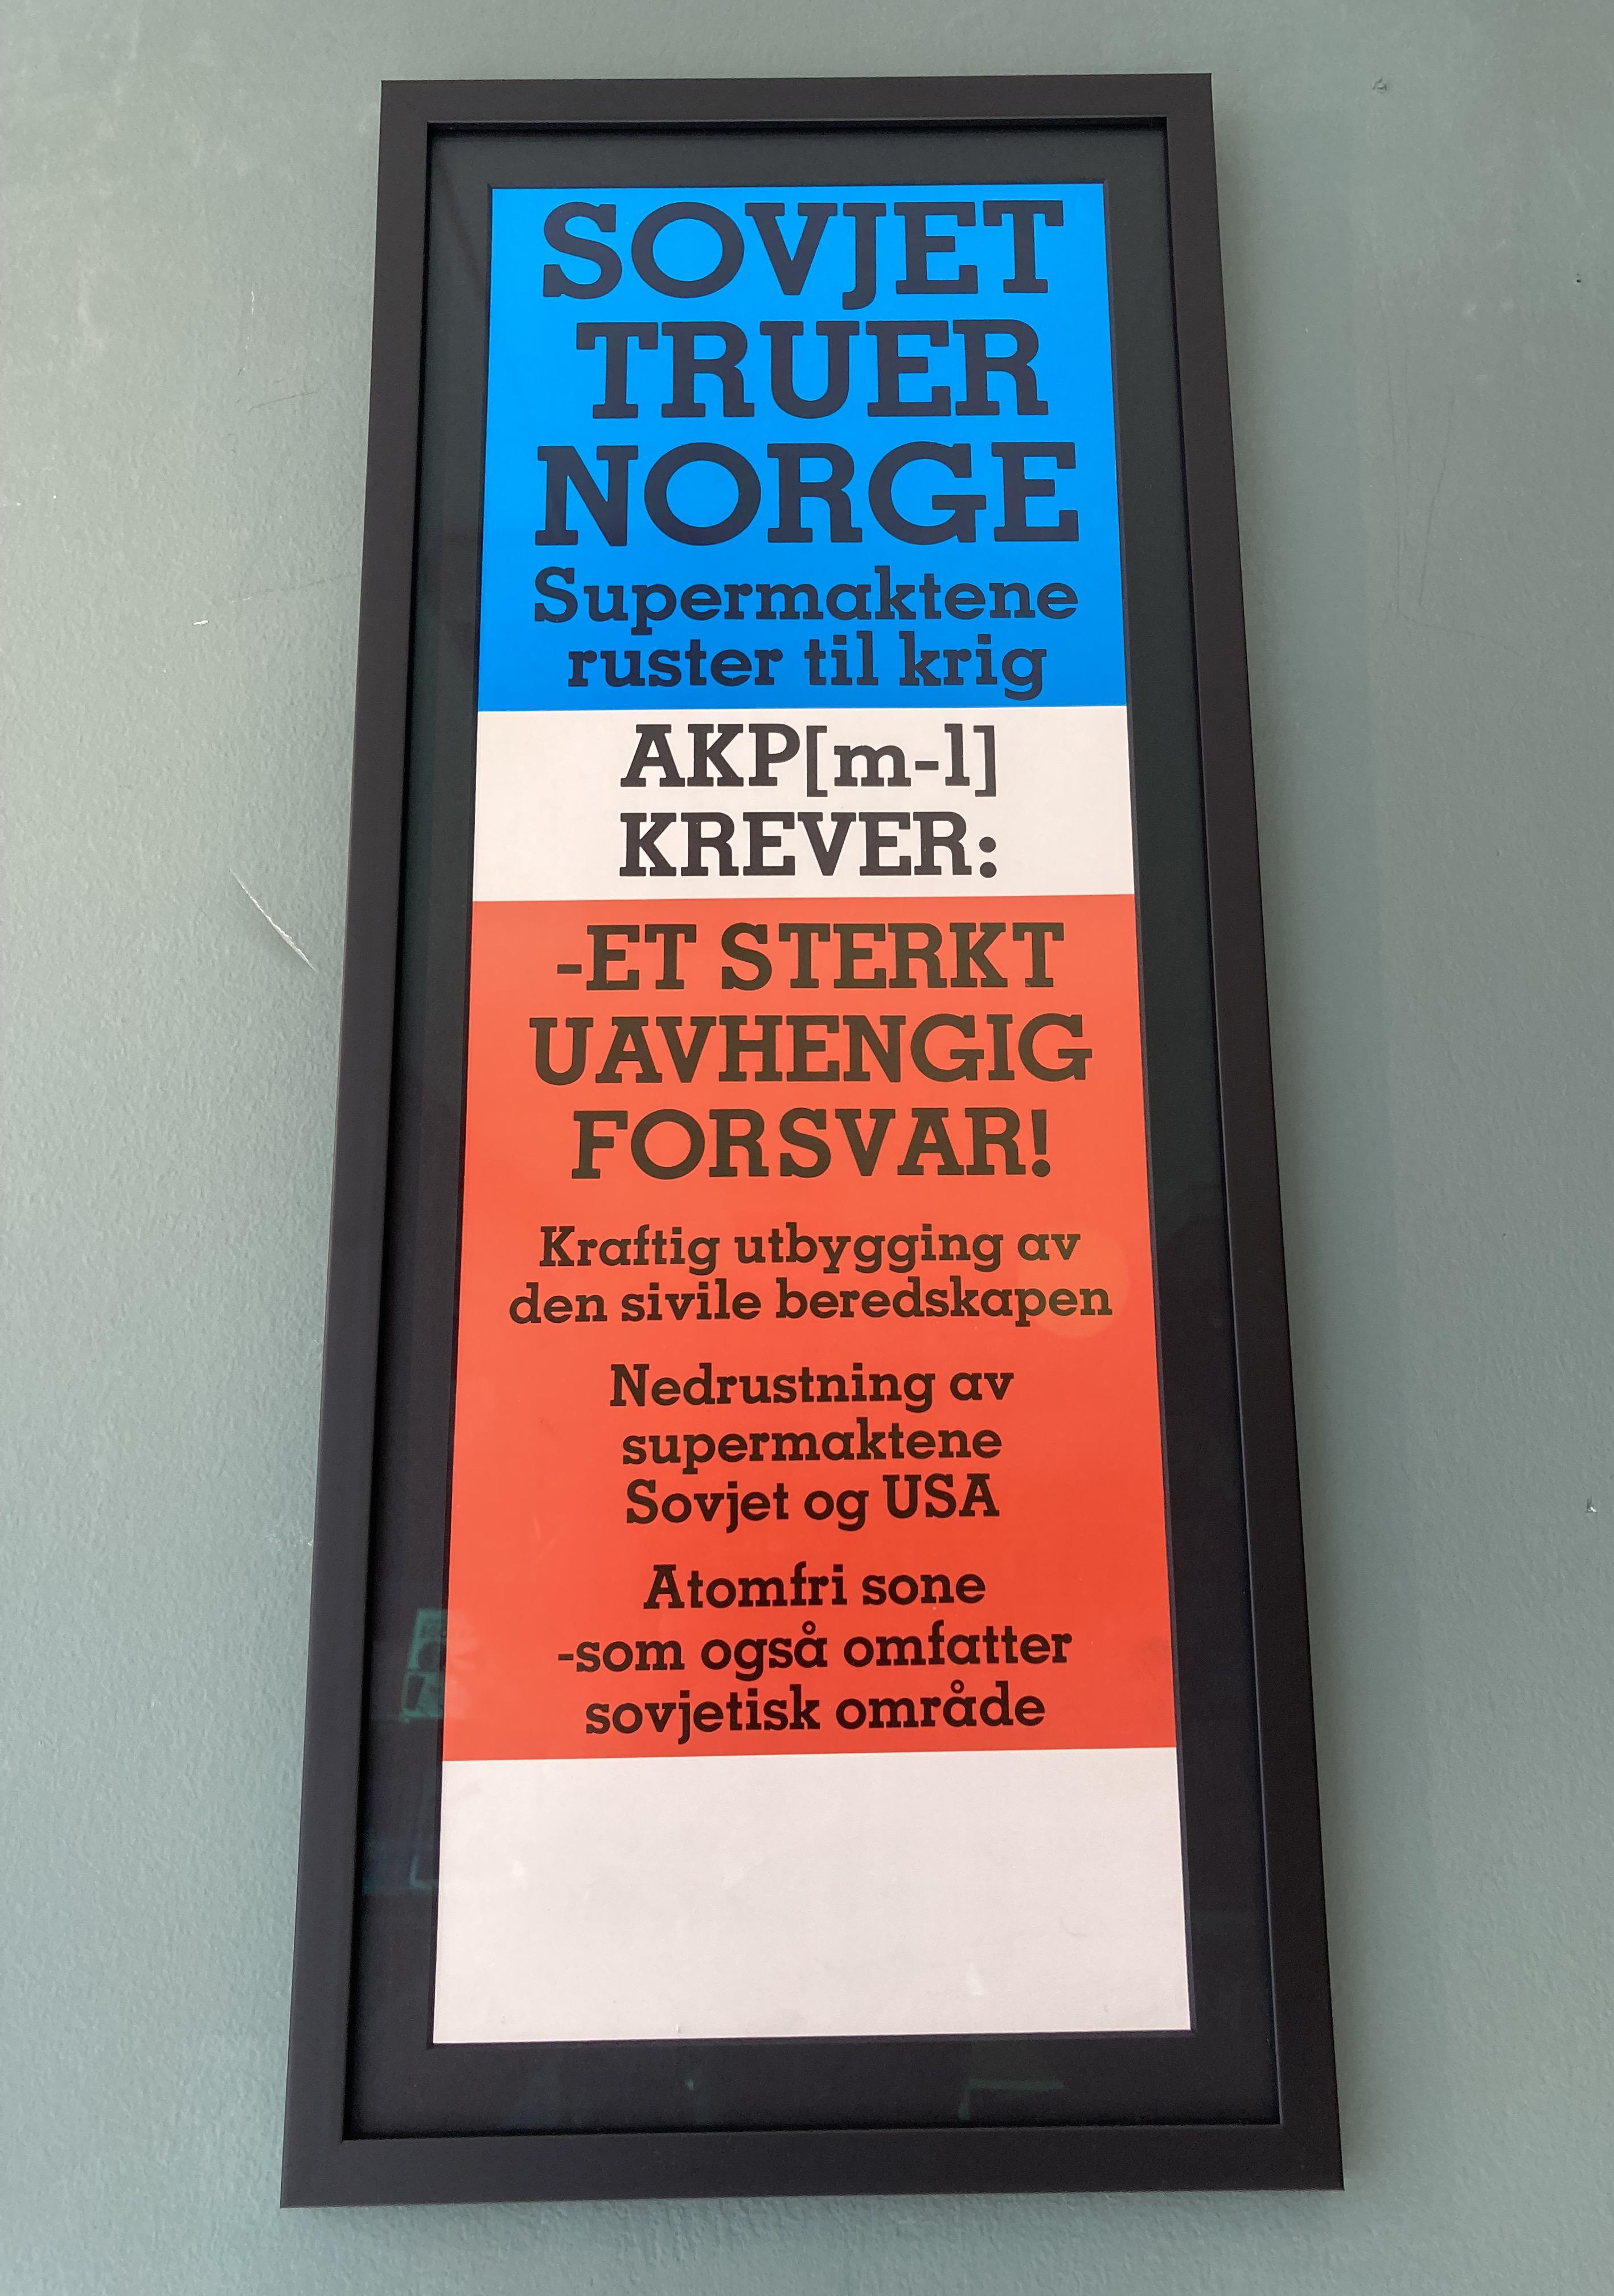 Sovjet truer Norge (ca. 1980)